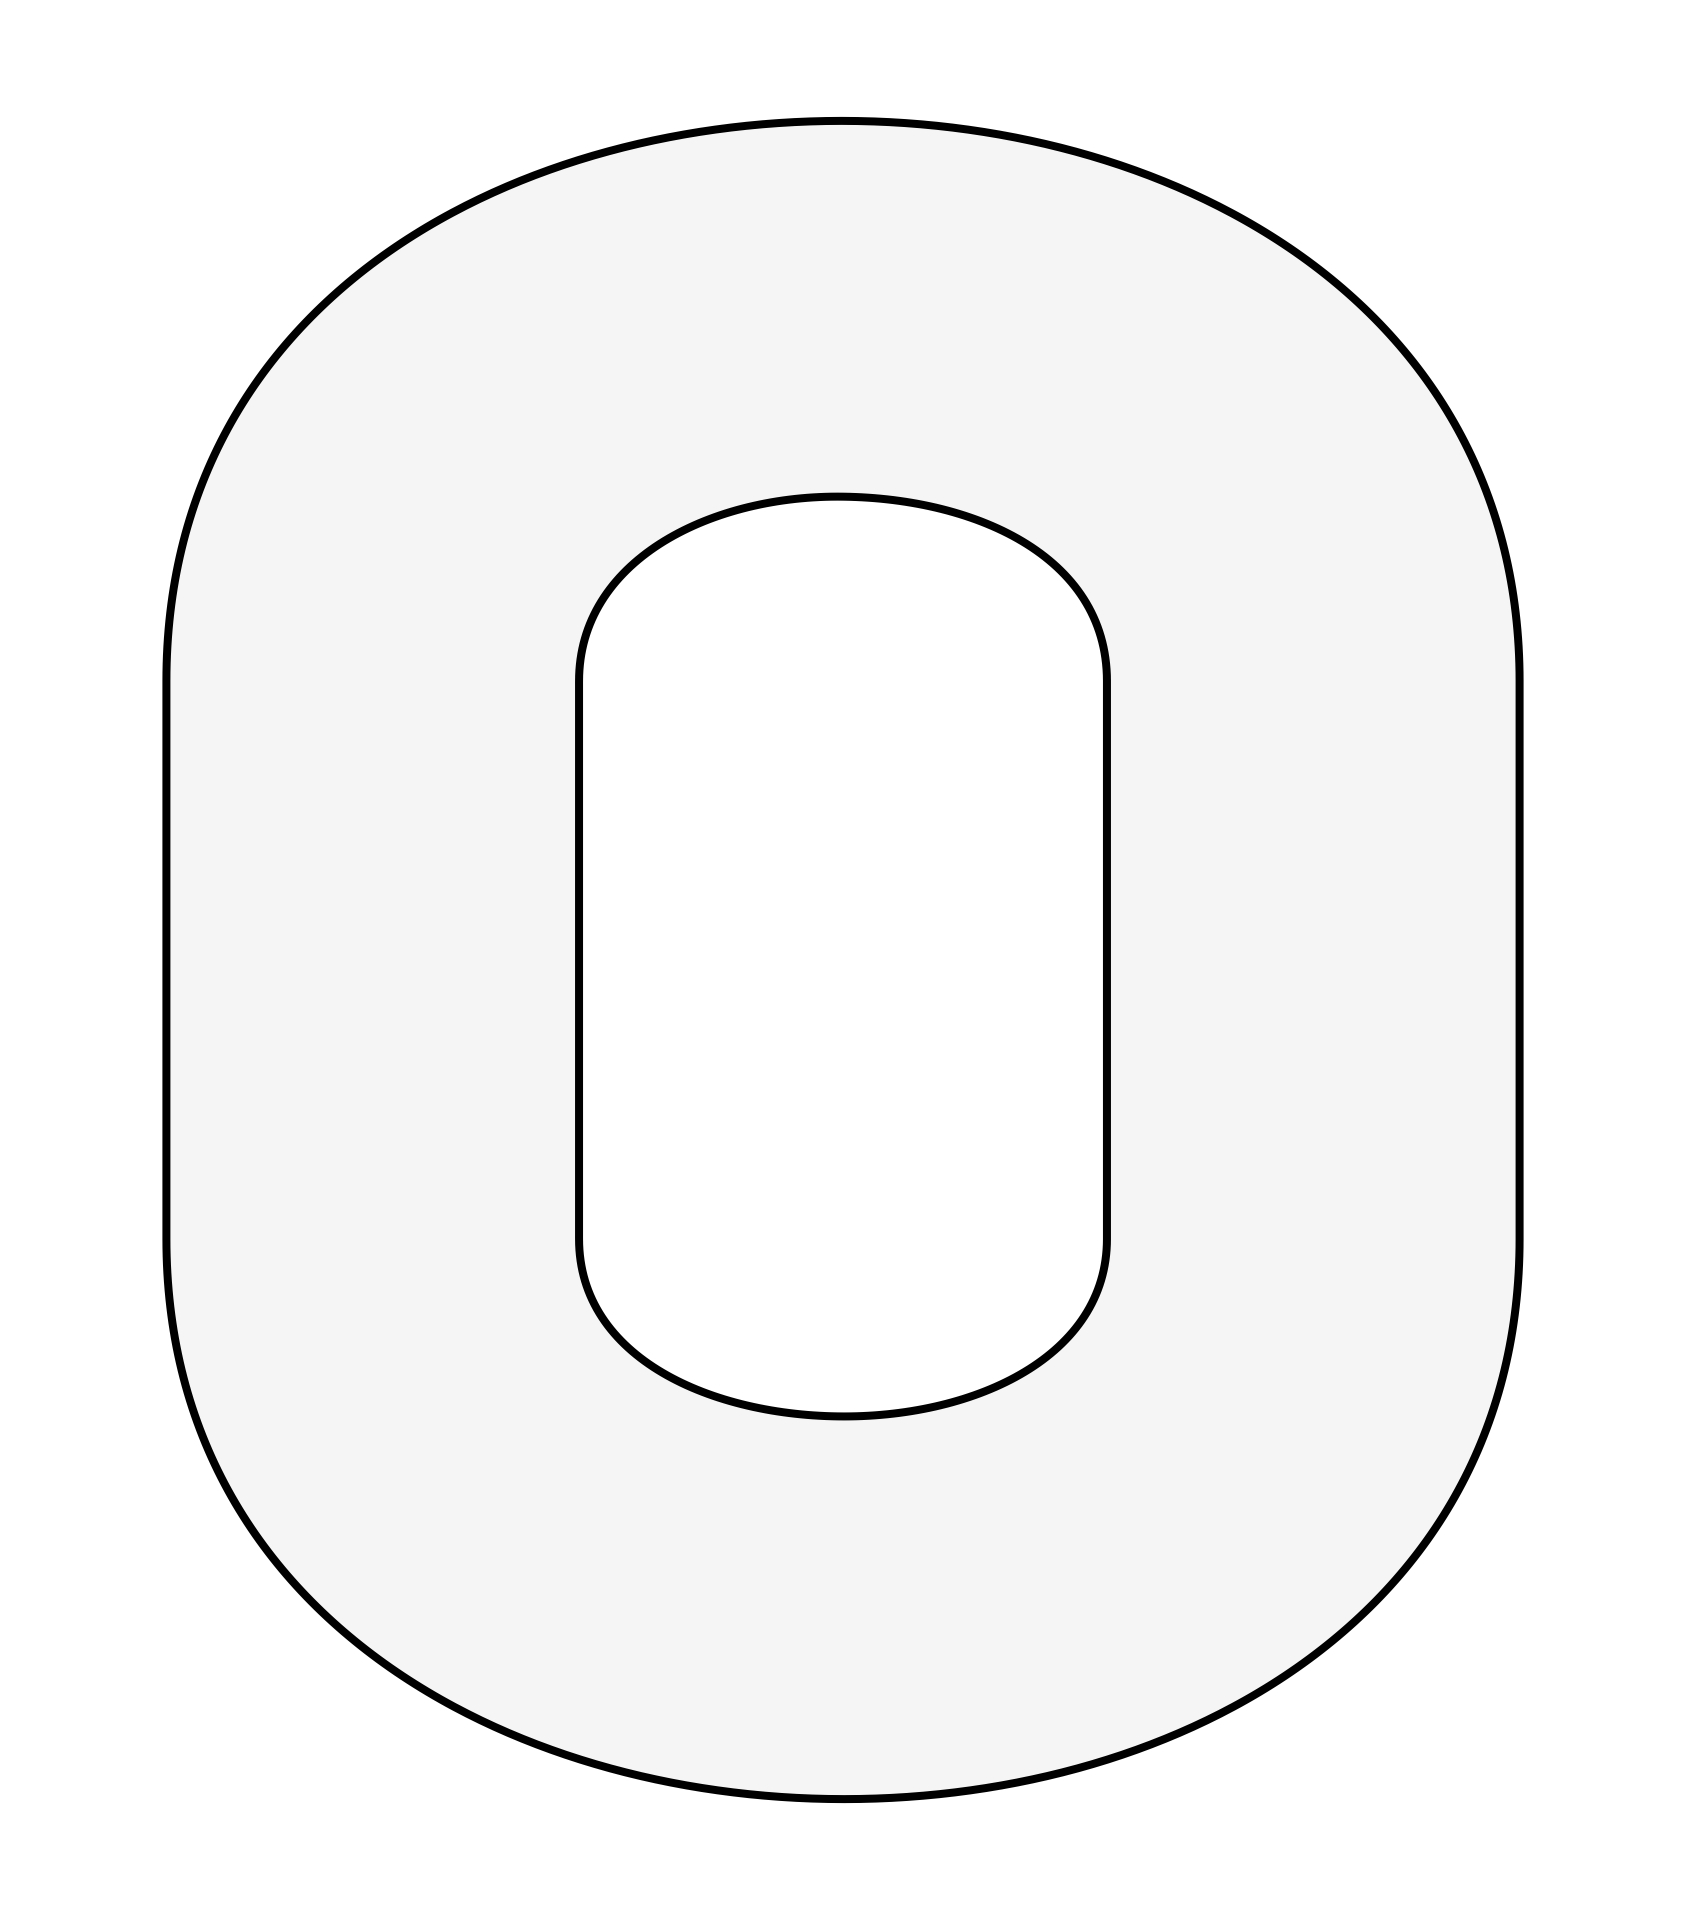 Printable Block Number Templates